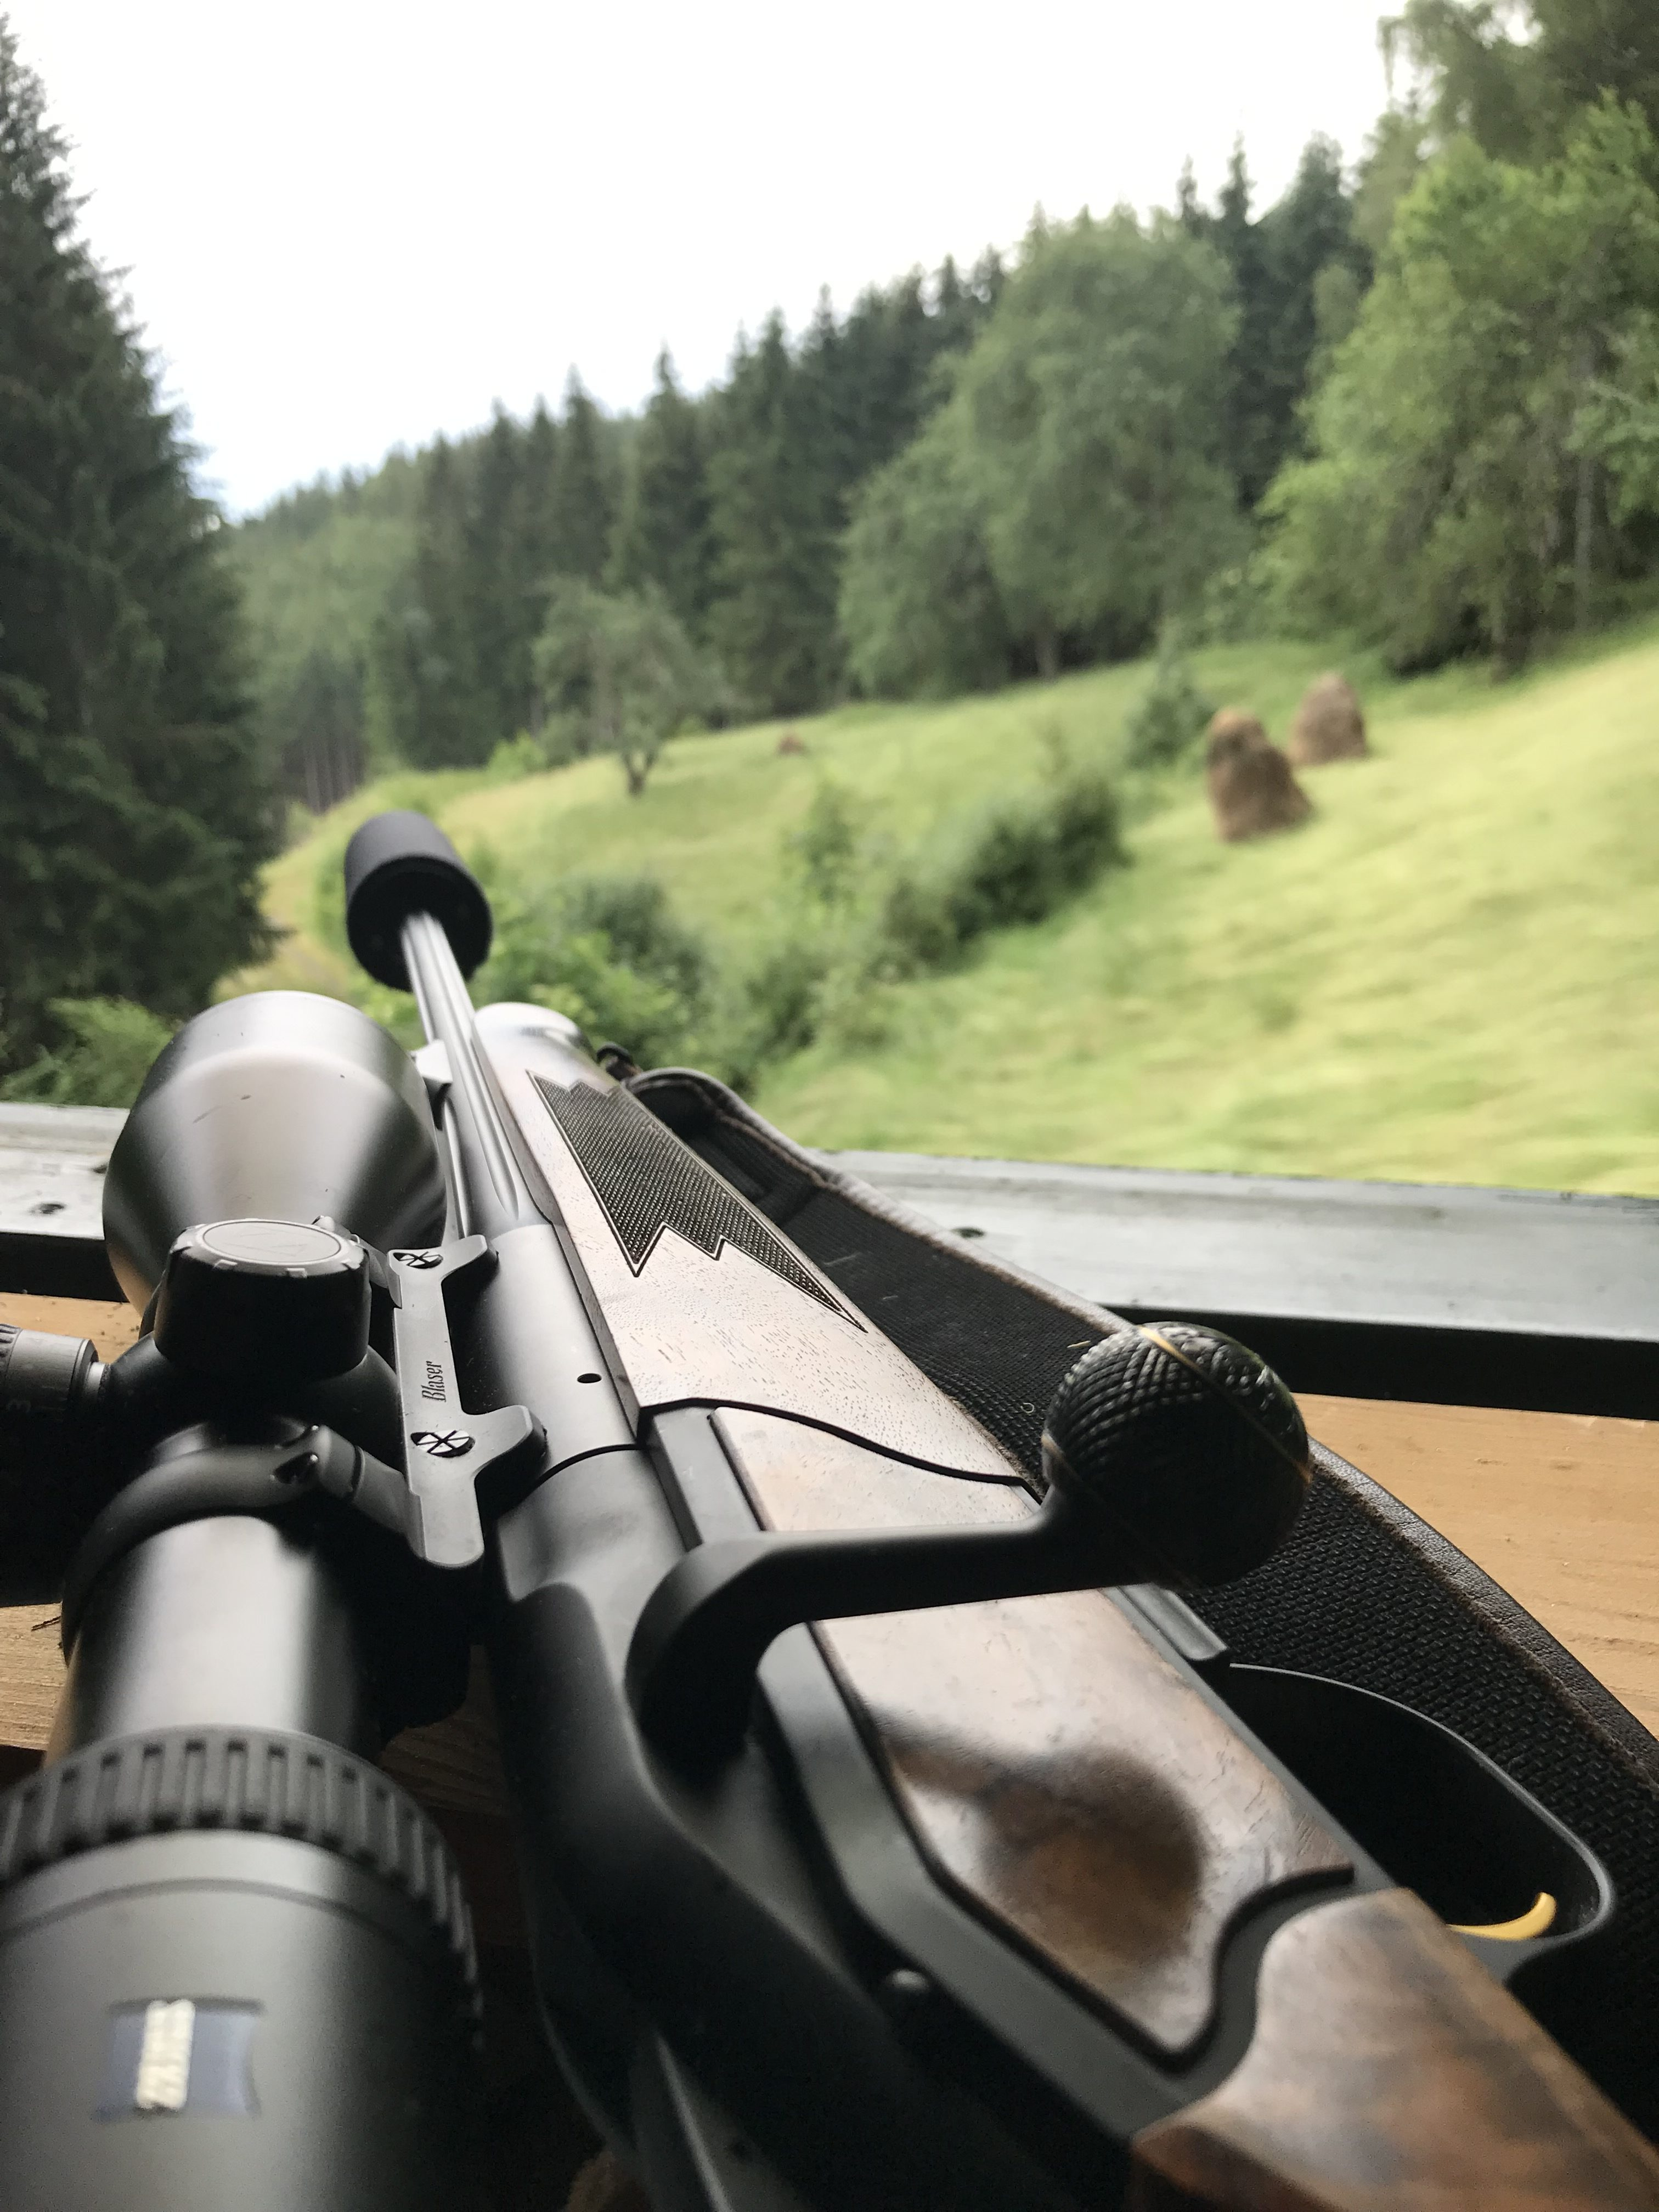 Ist die Jagd systemrelevant?